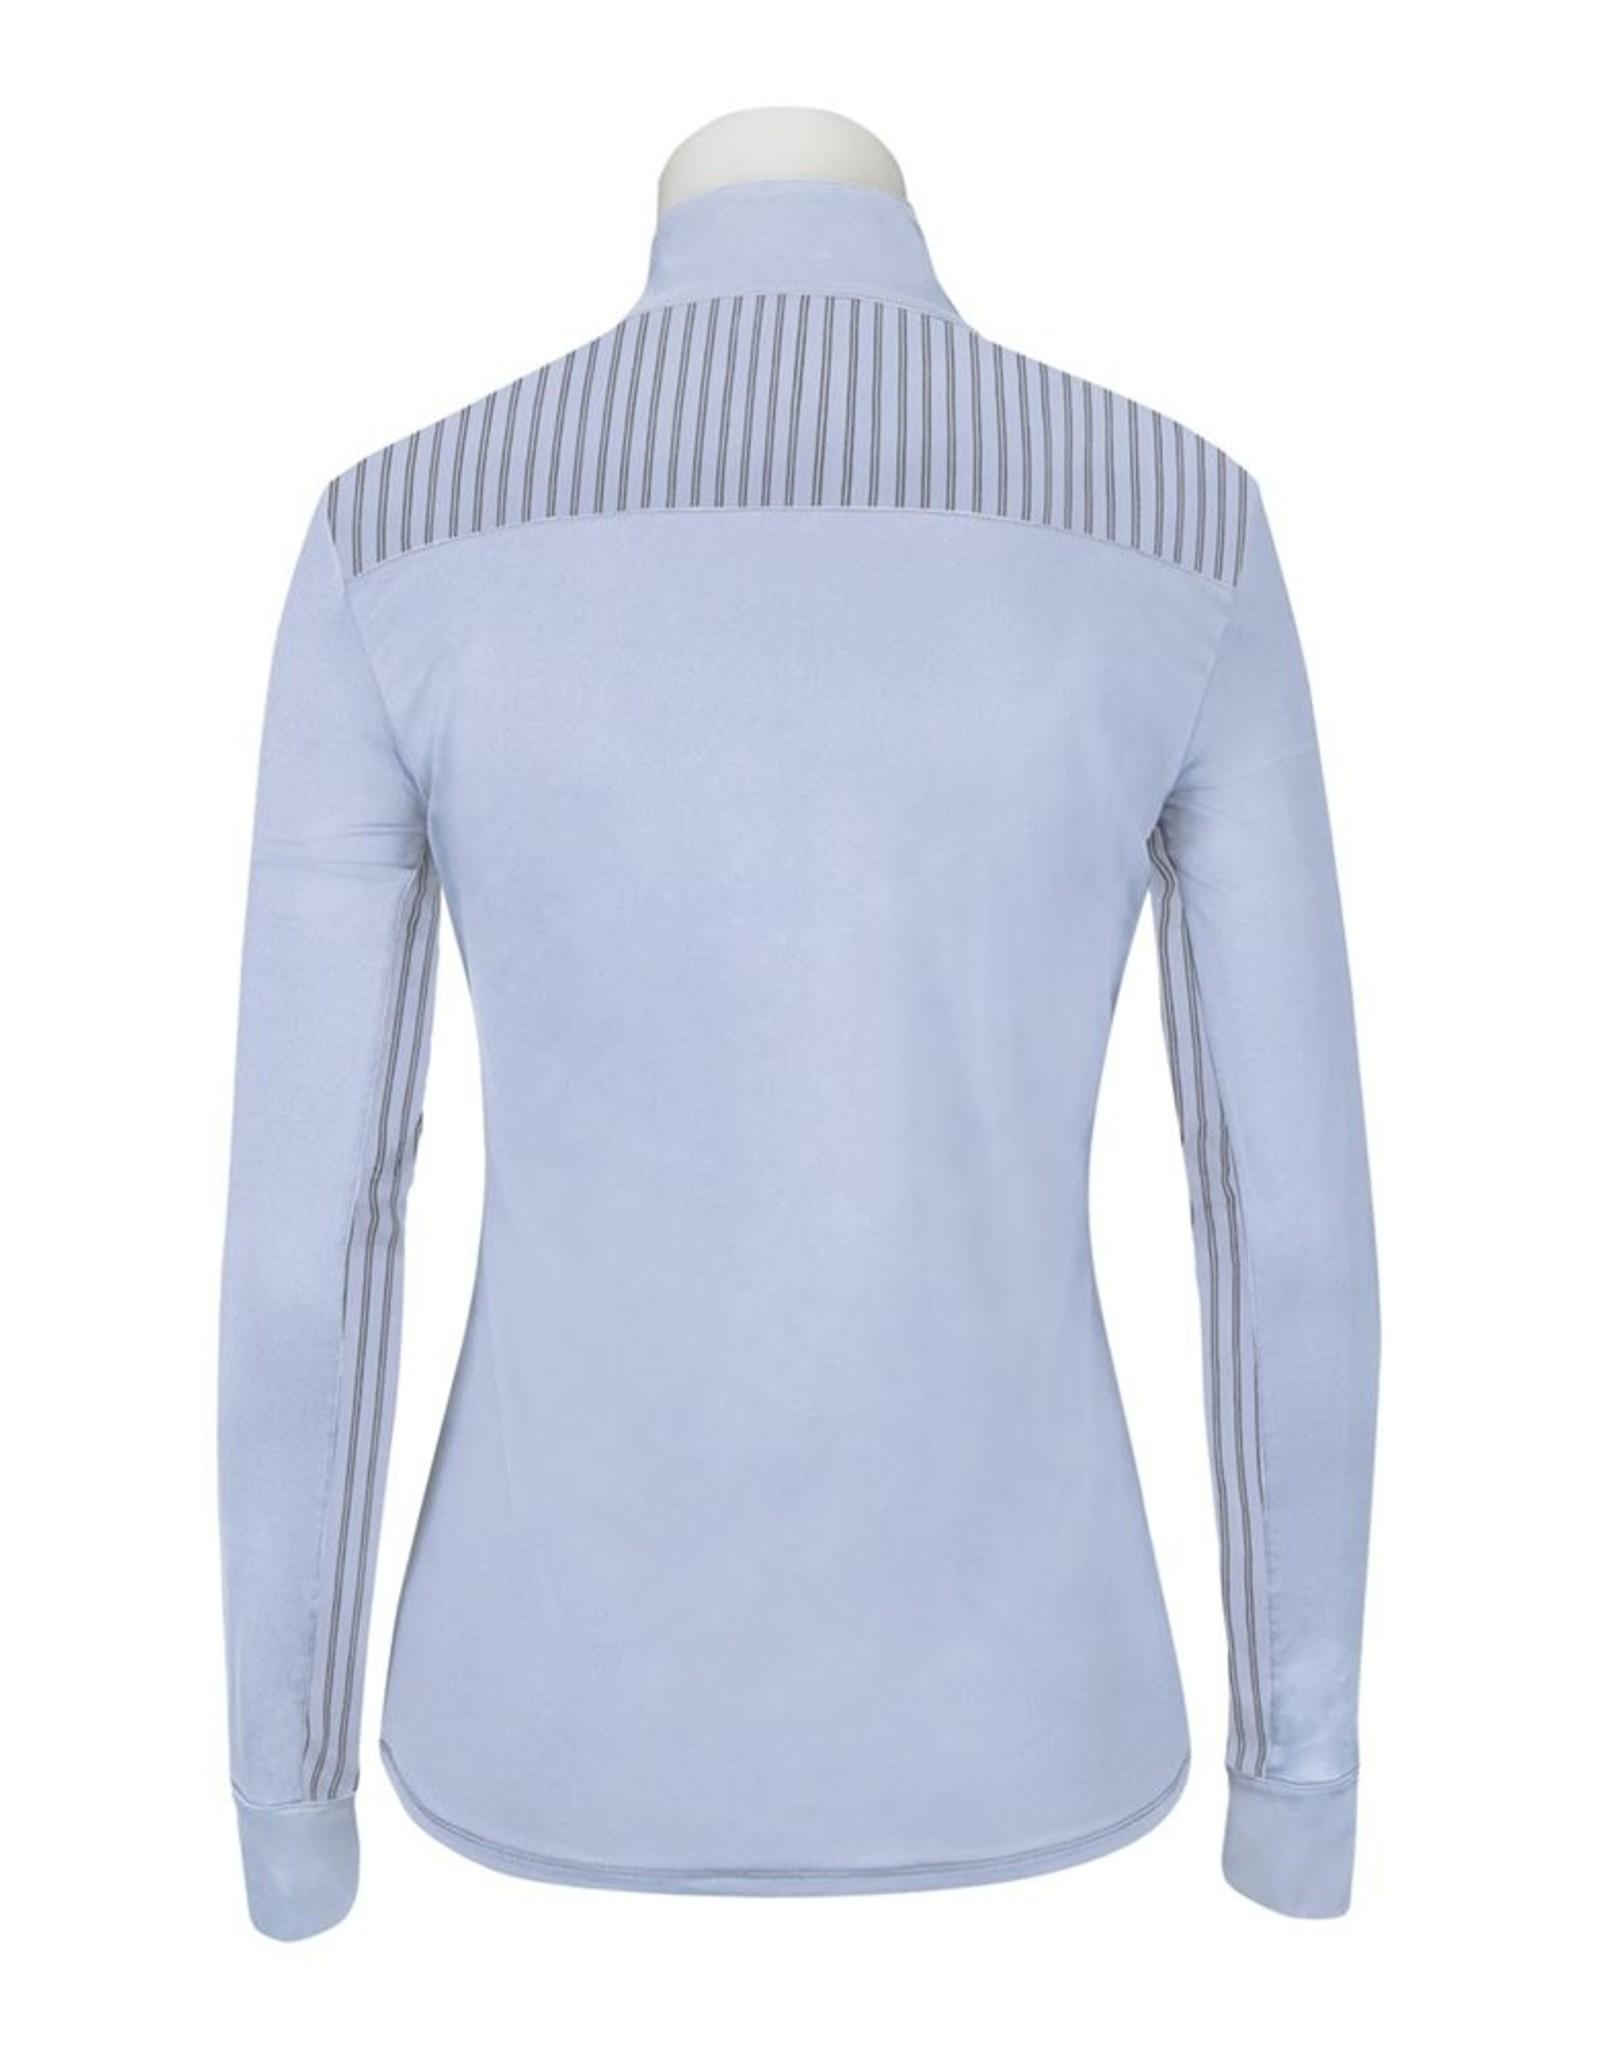 R.J. Classics Ladies' Ella Training Shirt